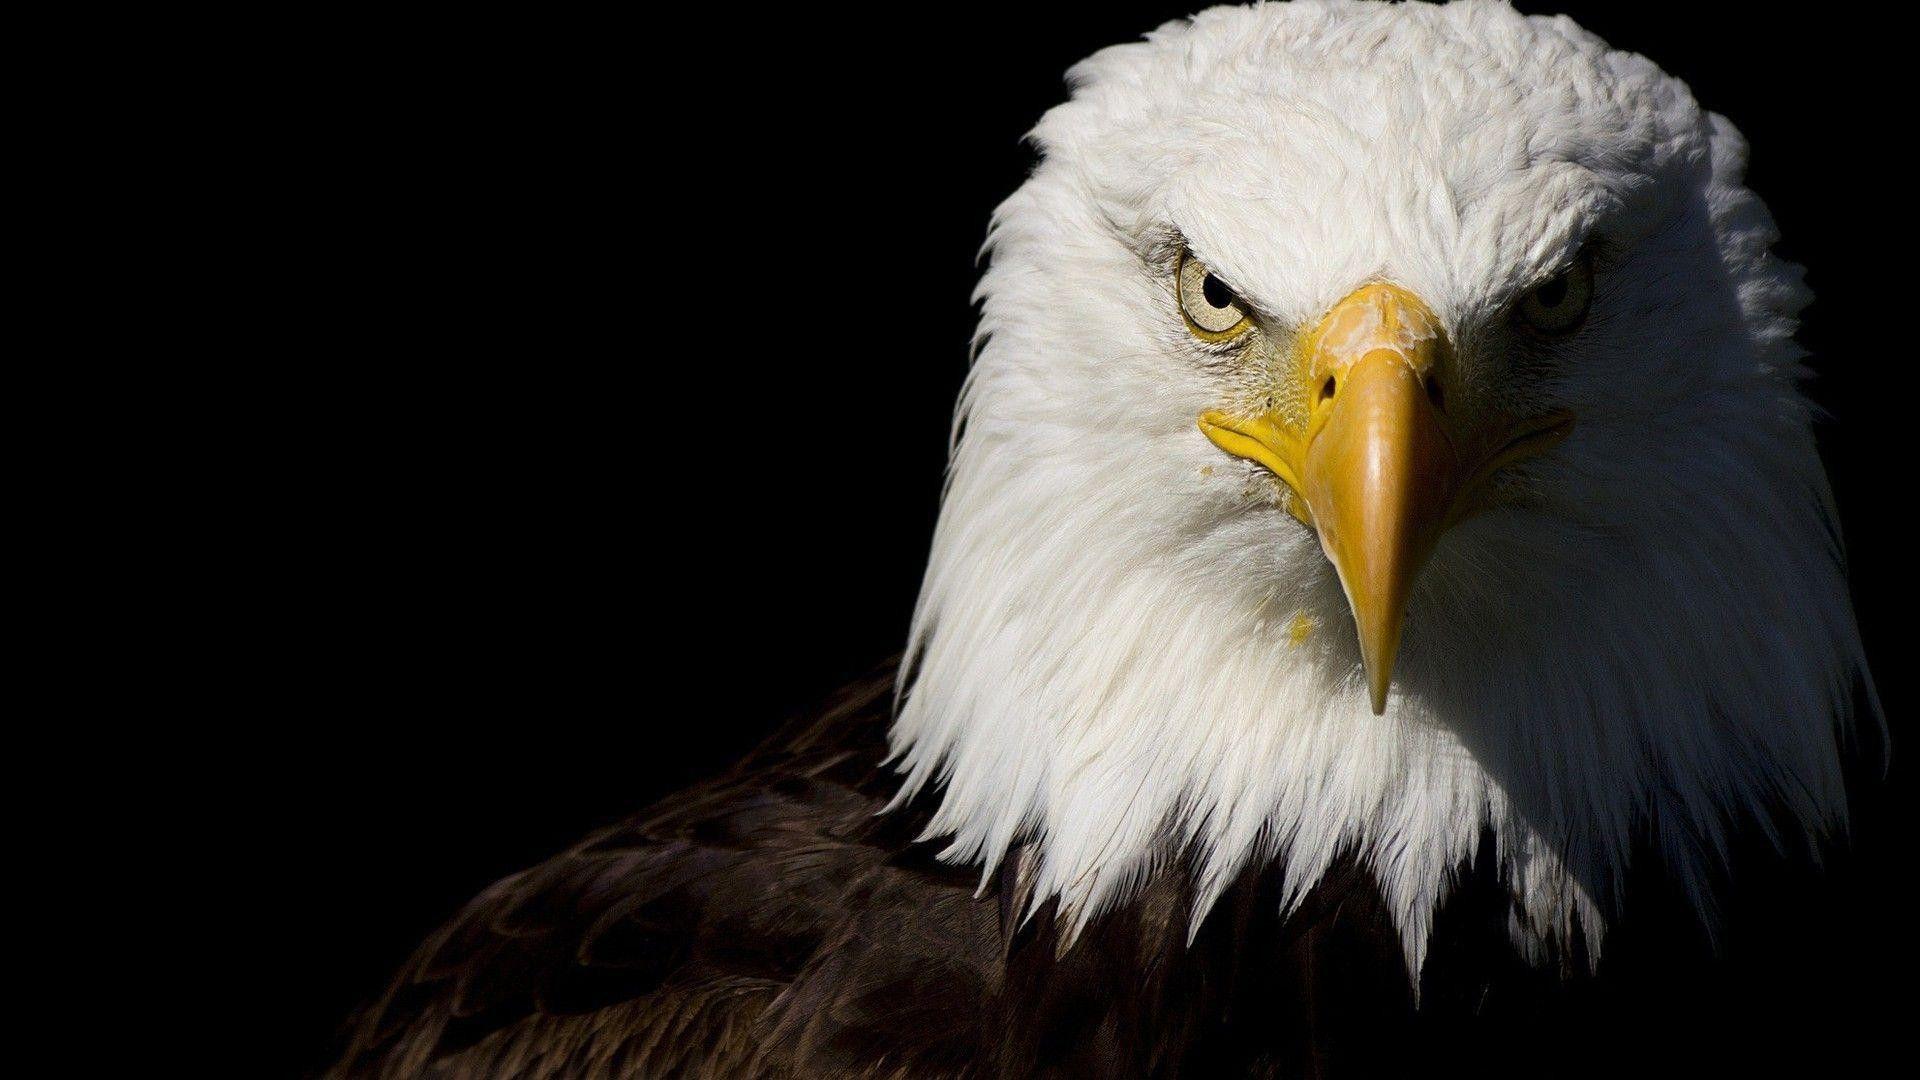 bald eagle 1920x1080 | animals | eagle wallpaper, eagle, eagle images